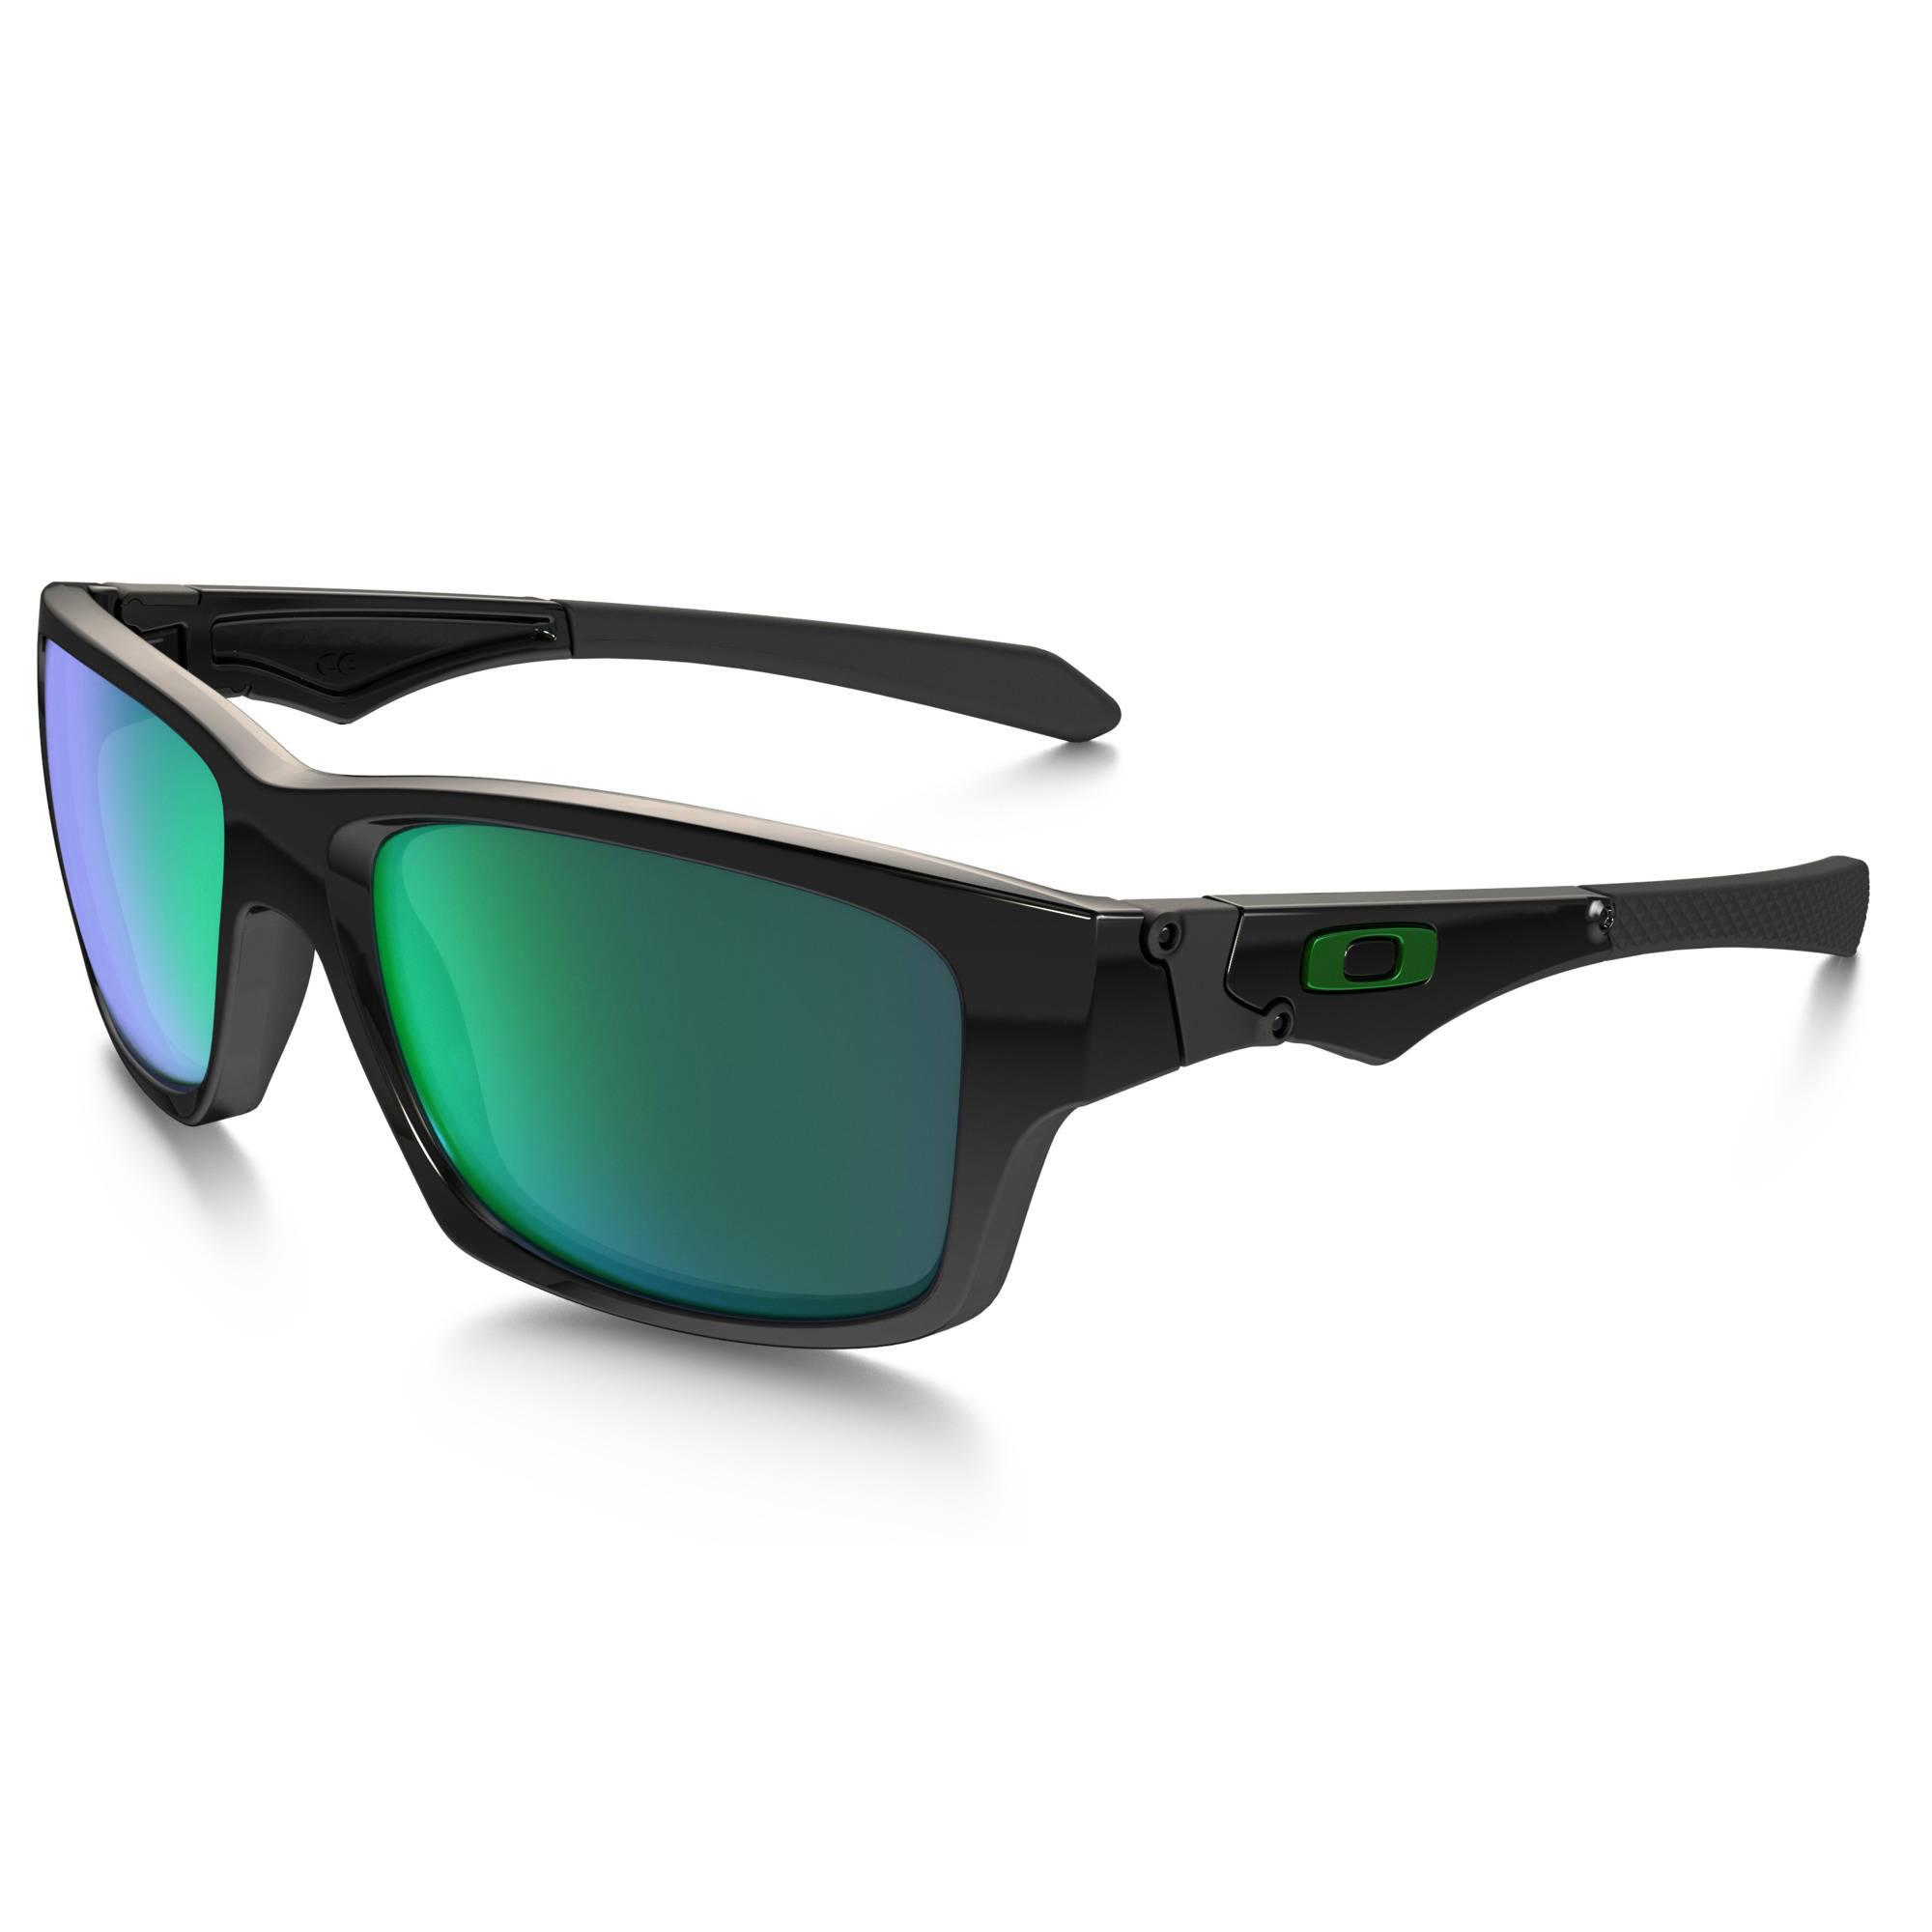 094b542cac Oakley Jupiter Squared Sunglasses 0OO9135-91350556 B H Photo